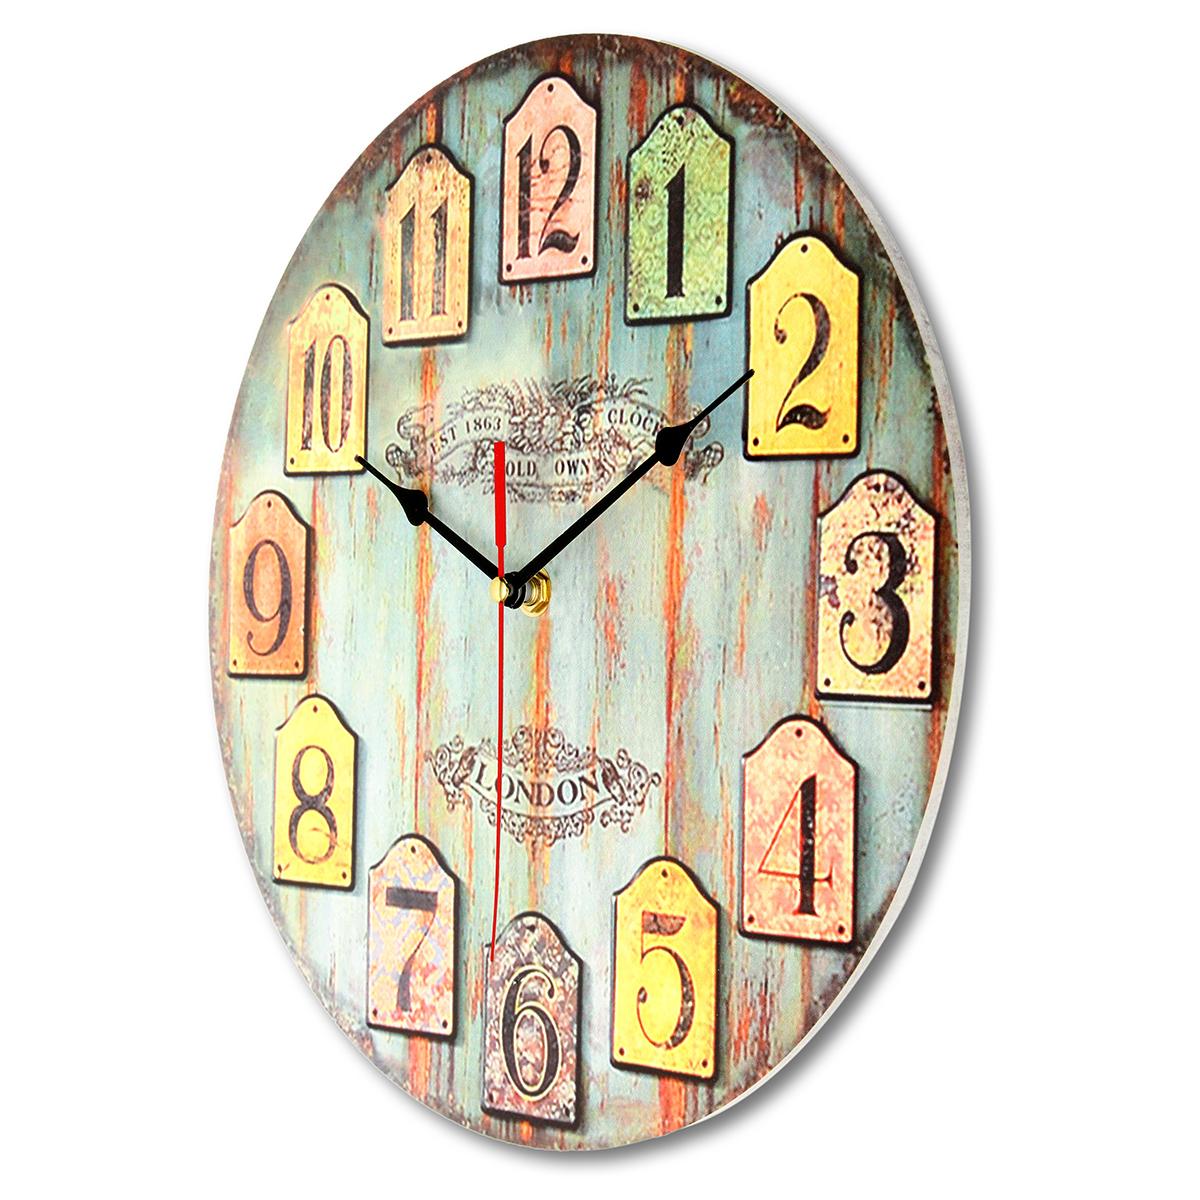 Retro Kitchen Wall Clocks Diy Large Wooden Wall Clock Home Decor Shabby Chic Rustic Retro